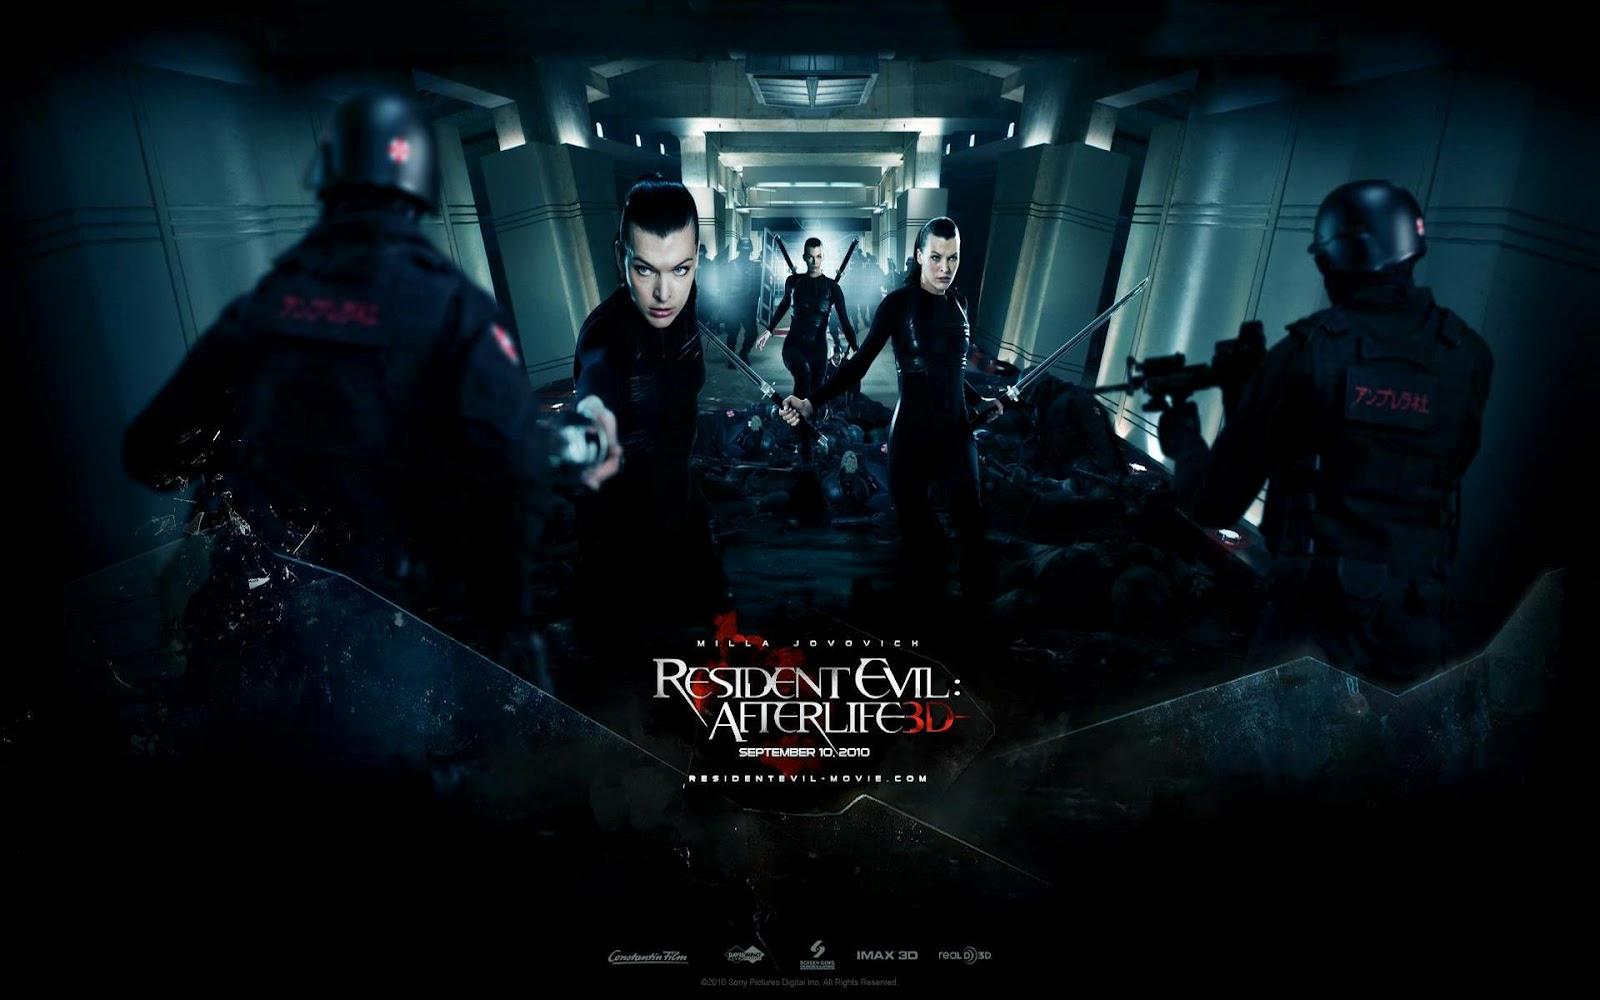 http://2.bp.blogspot.com/-vTV0wnQ4-8Q/UHLyIEr79SI/AAAAAAAAAnQ/-9CRFyrbsyU/s1600/Resident-Evil-wallpaper-4.jpg